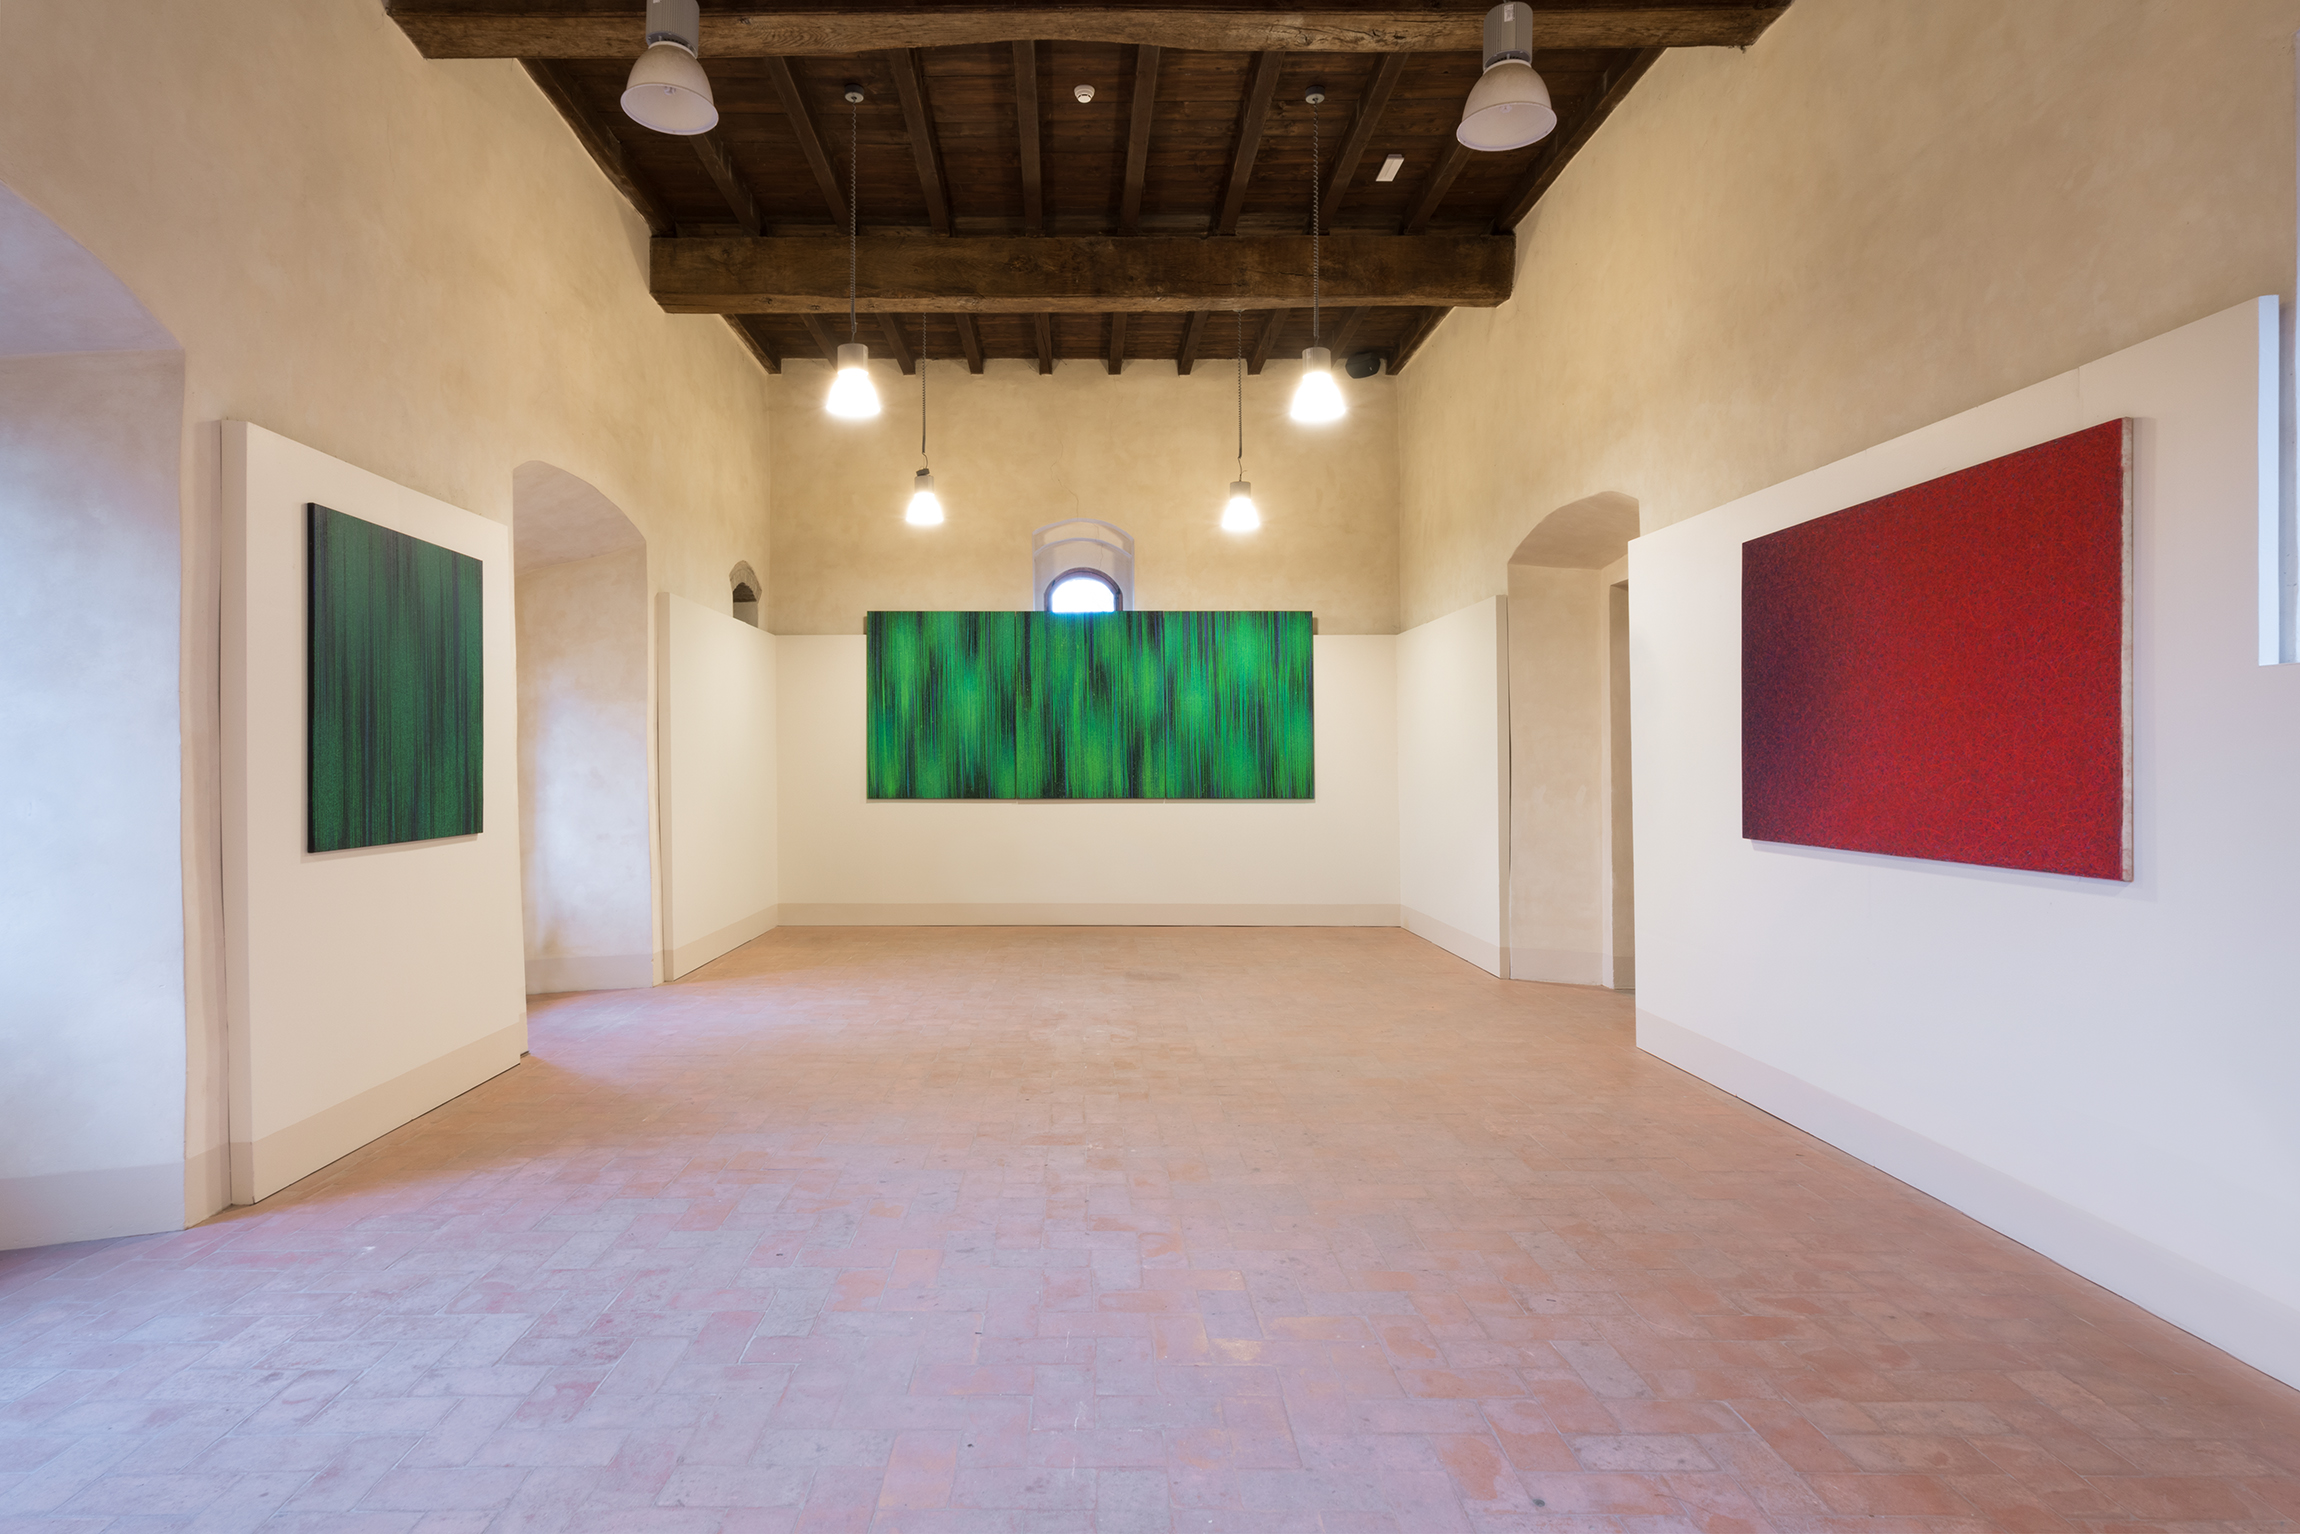 2. Luca Macauda - Ciane - vista della mostra - 2018